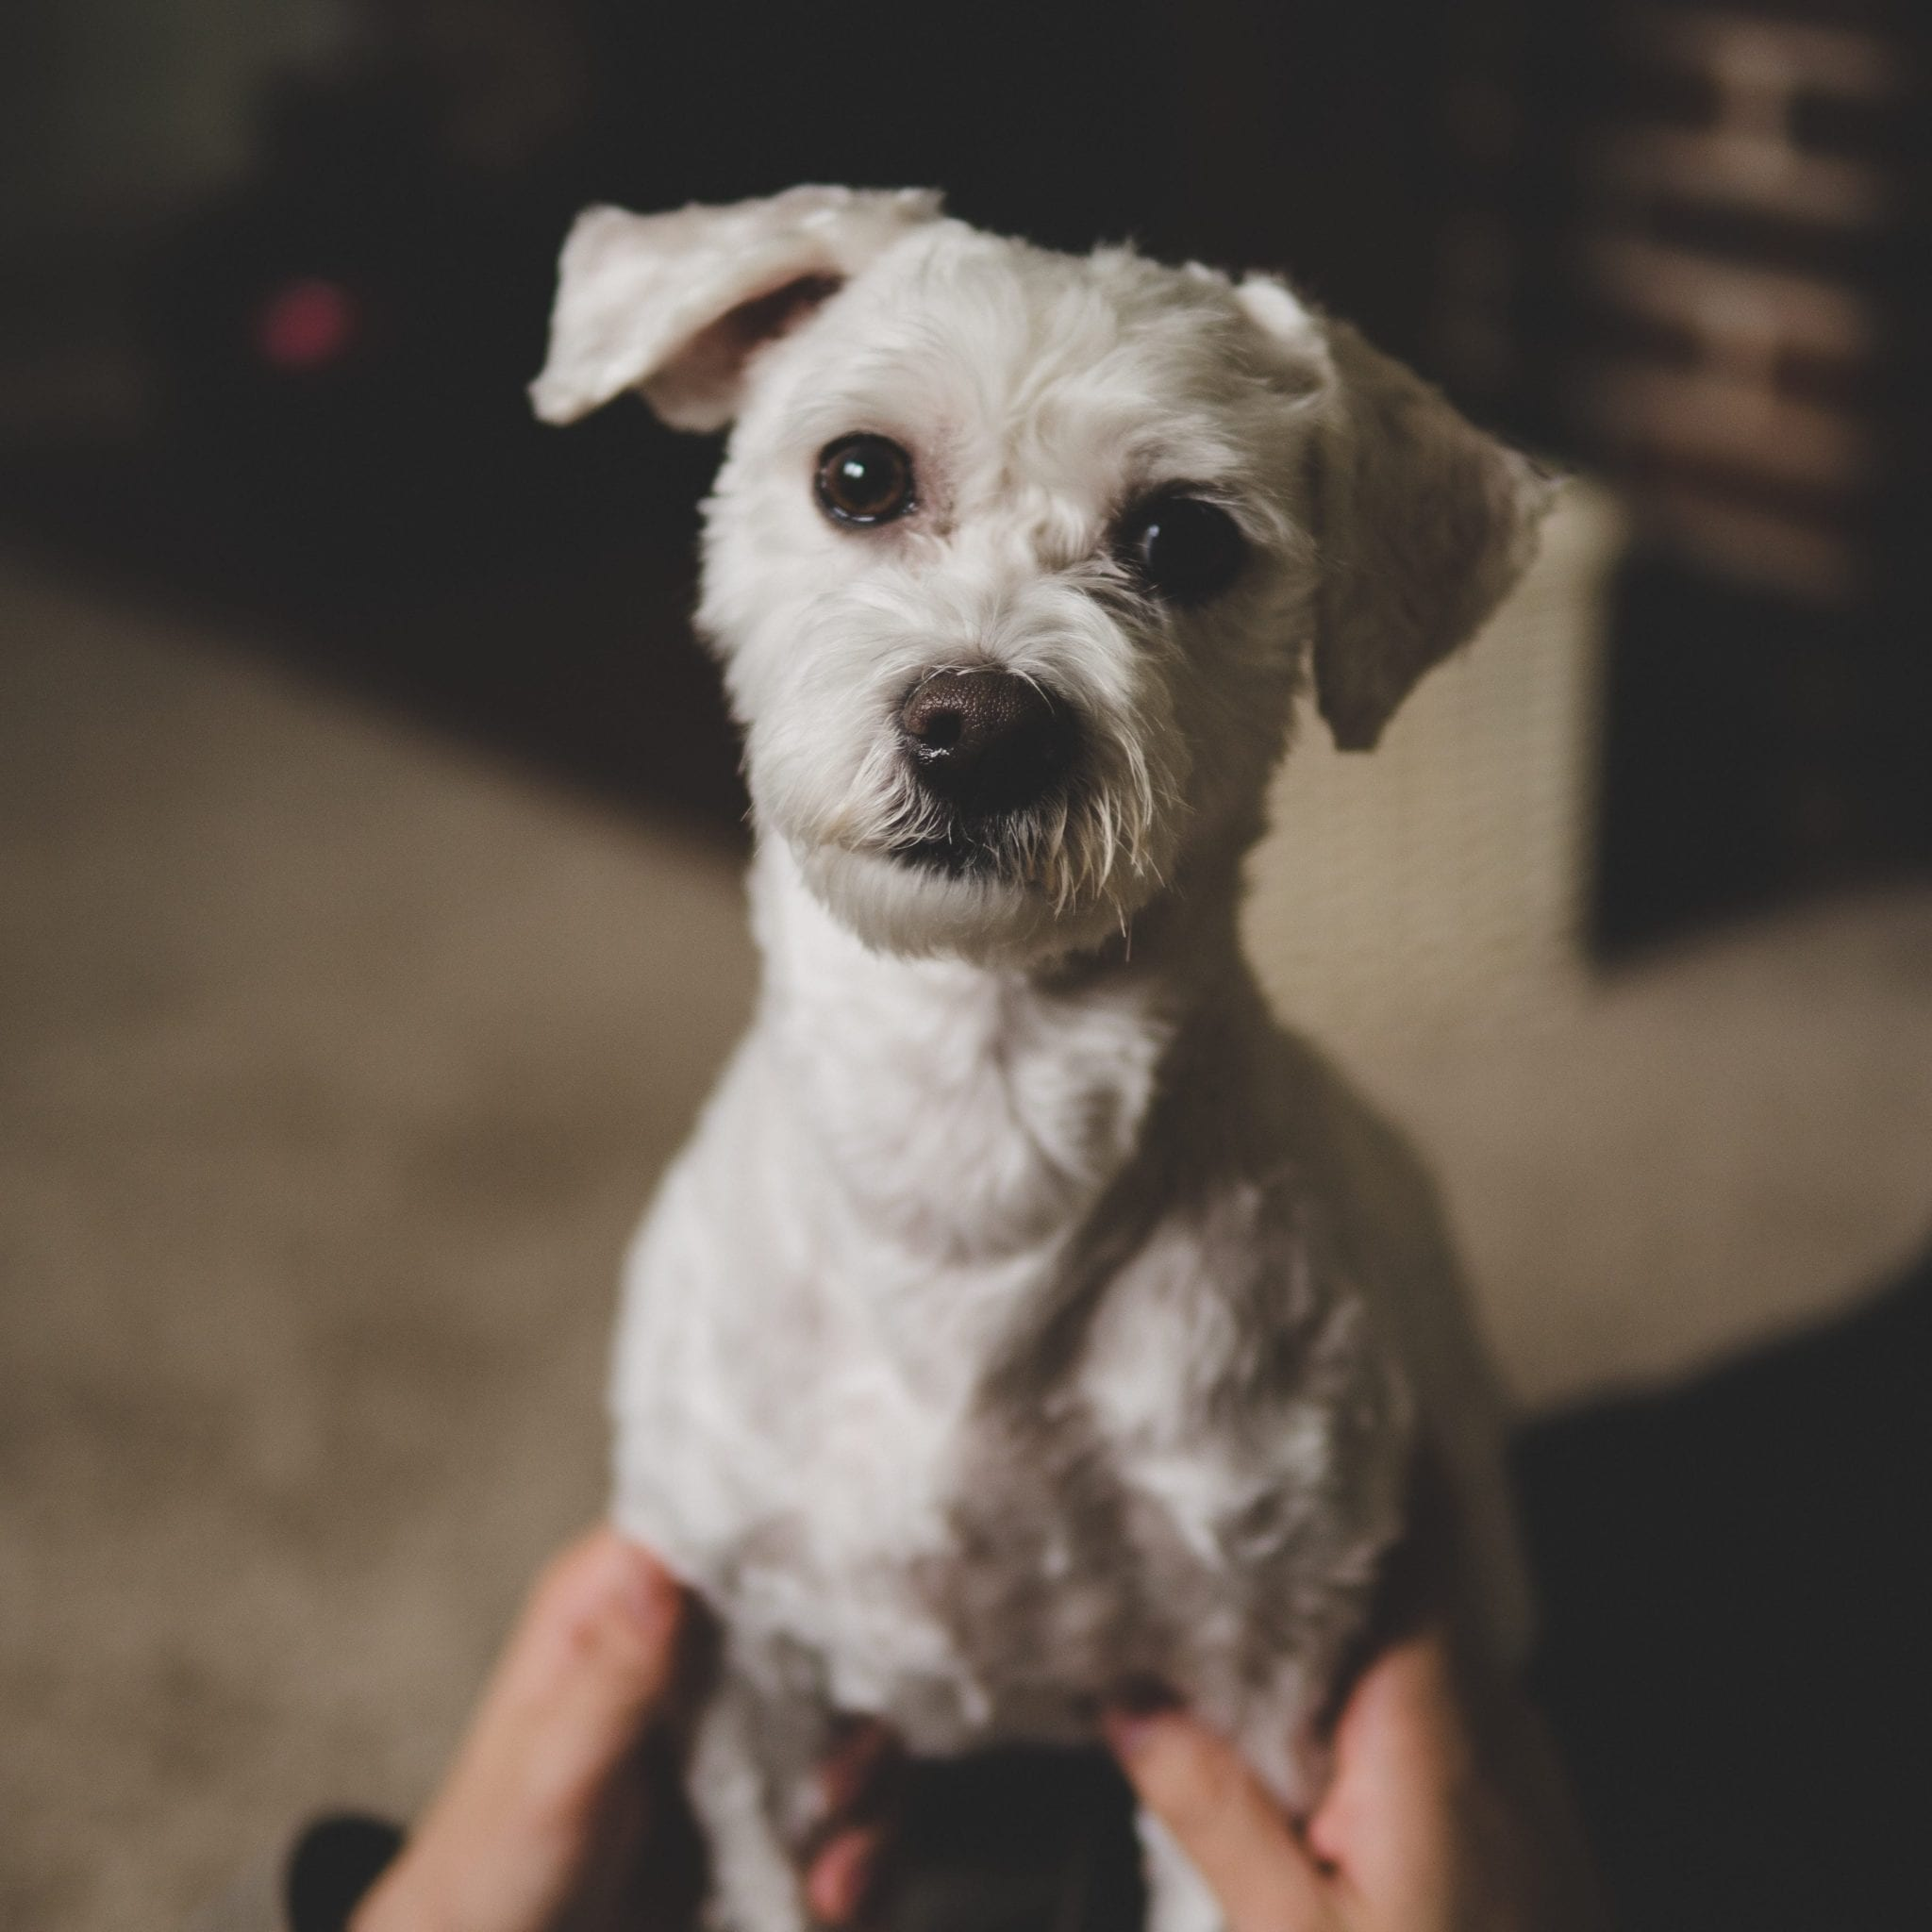 Hundehaltung Tipps